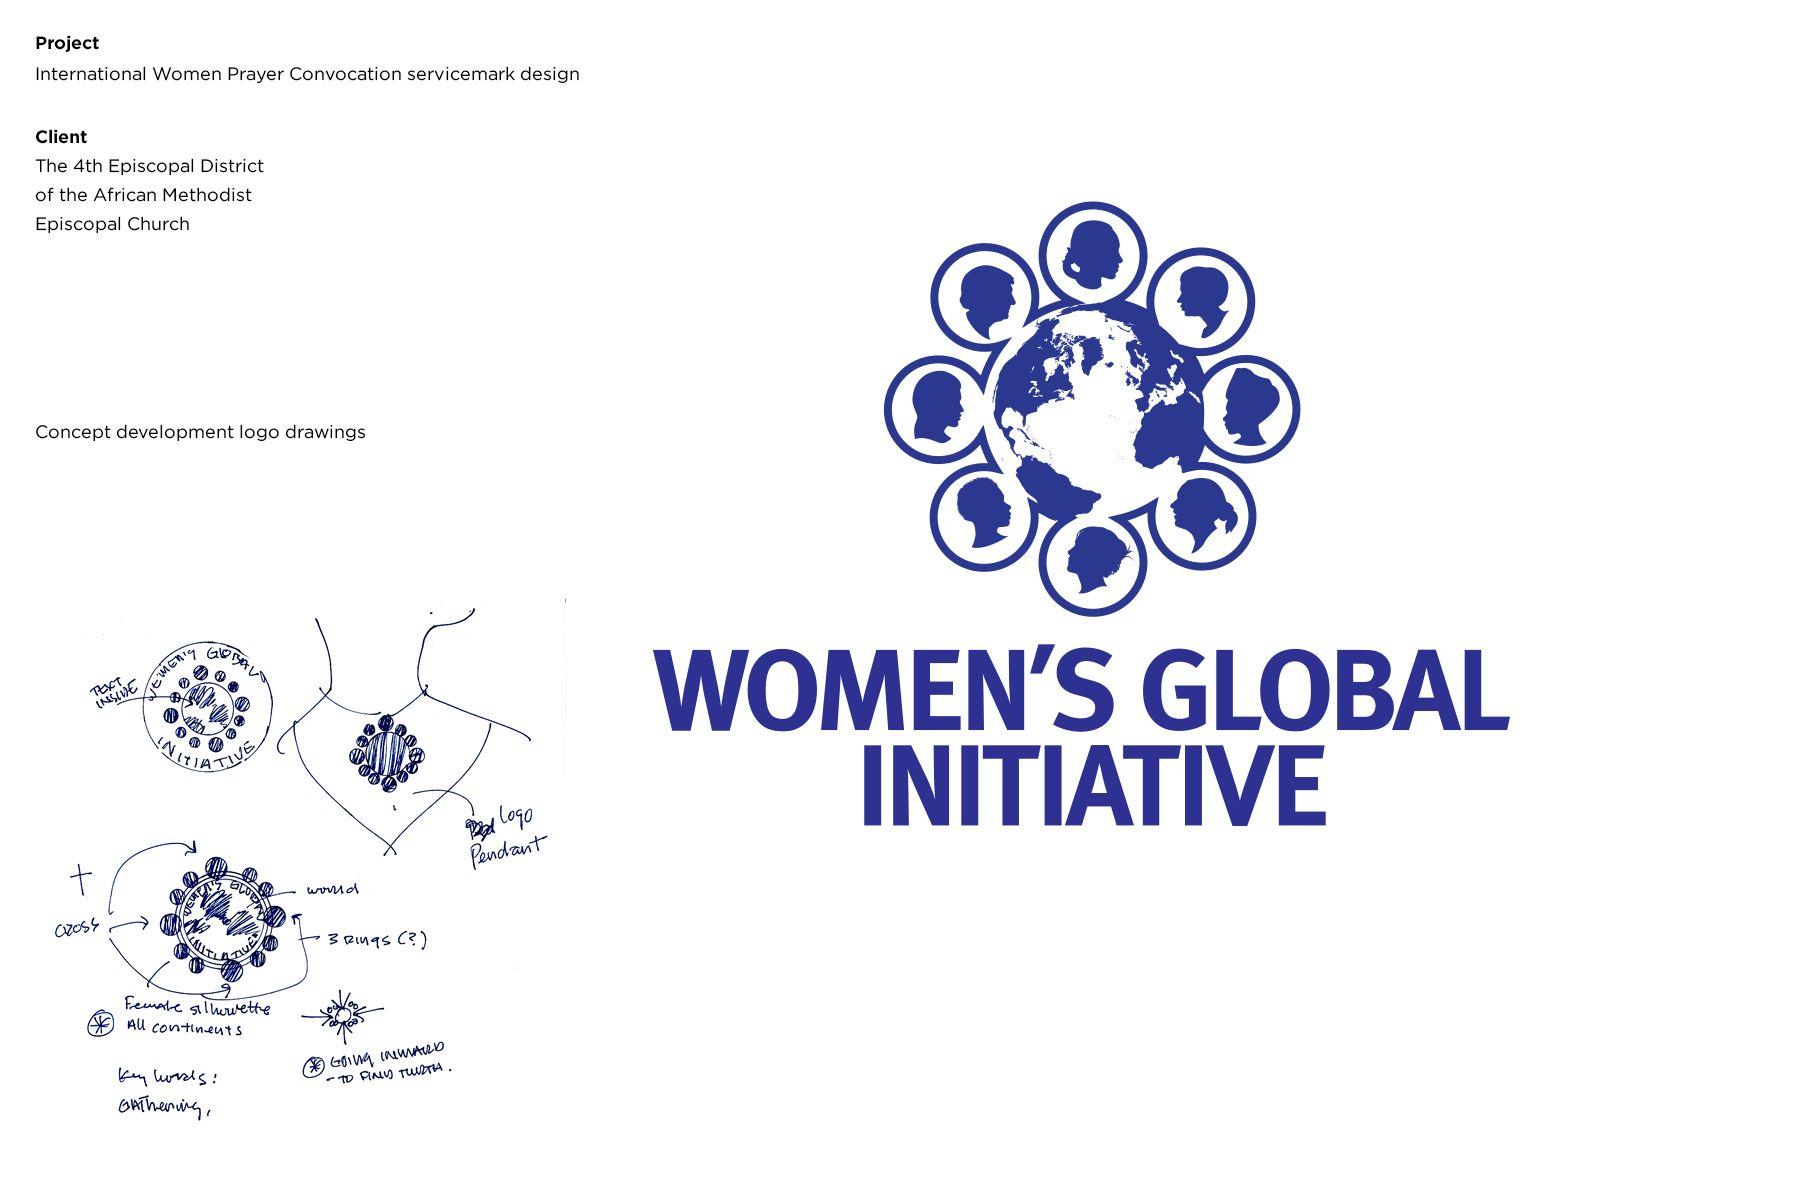 IWGC_WGI-Logo.jpg